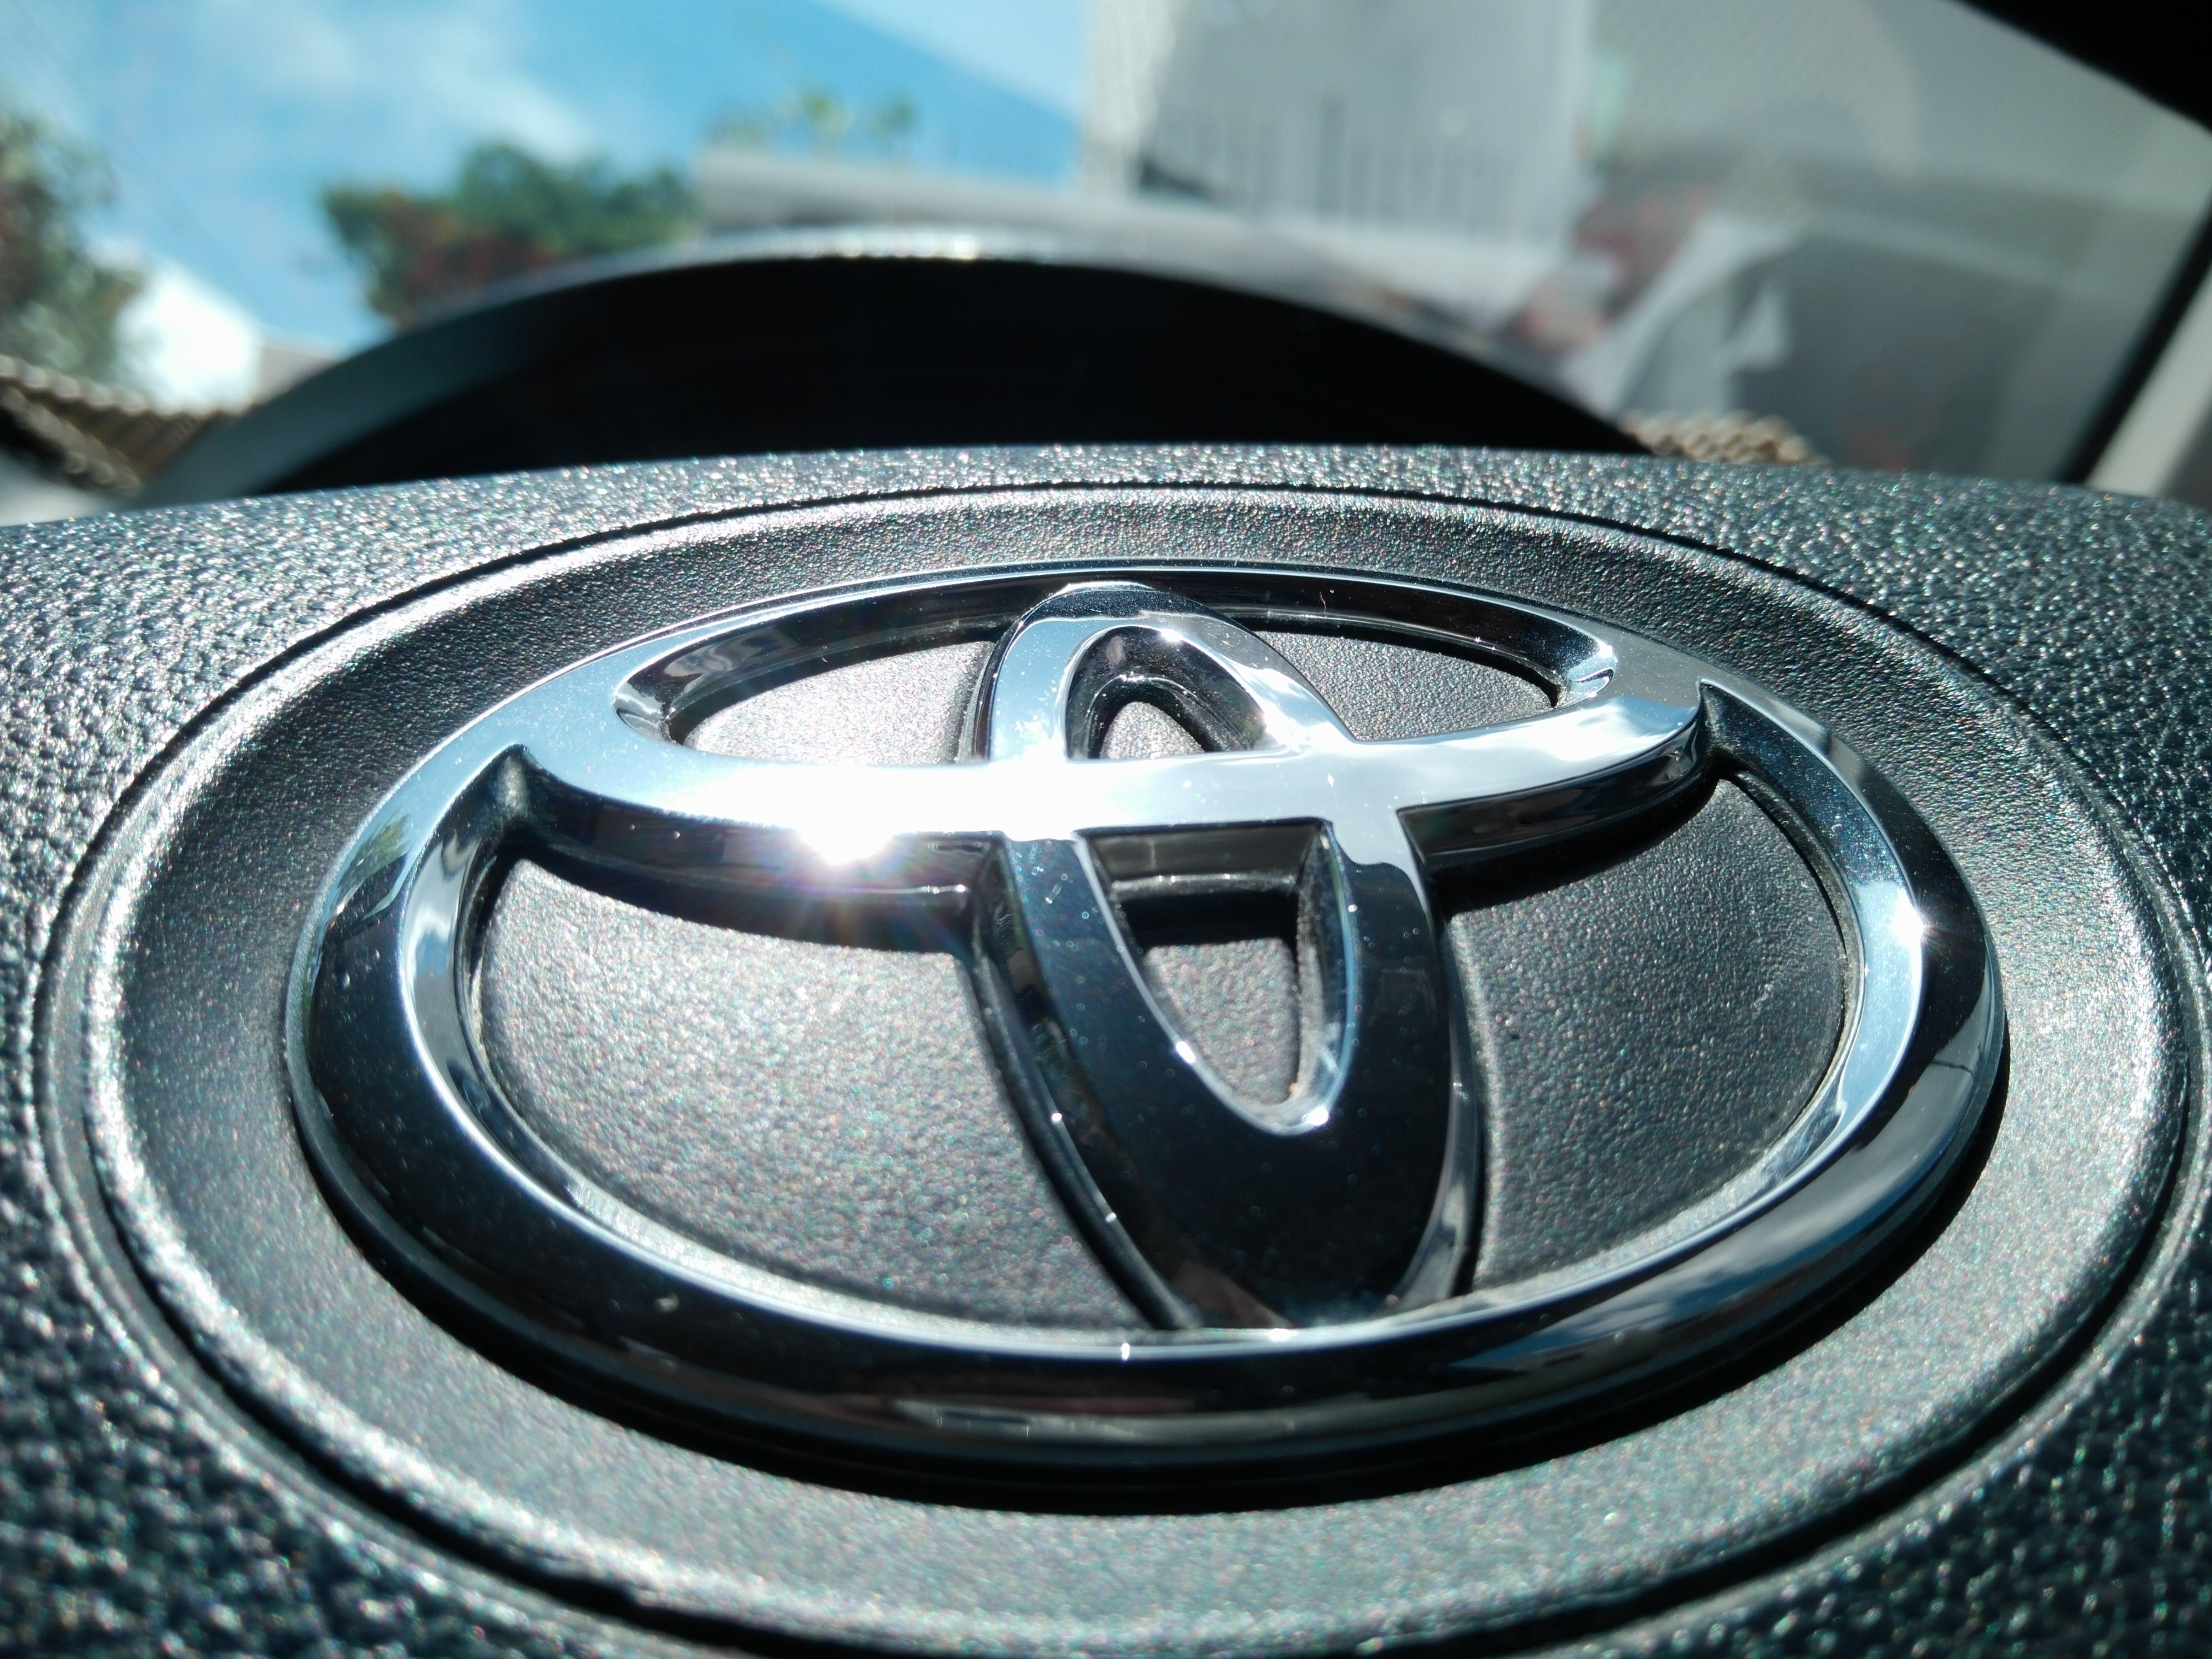 Free stock photo of Toyota Emblem